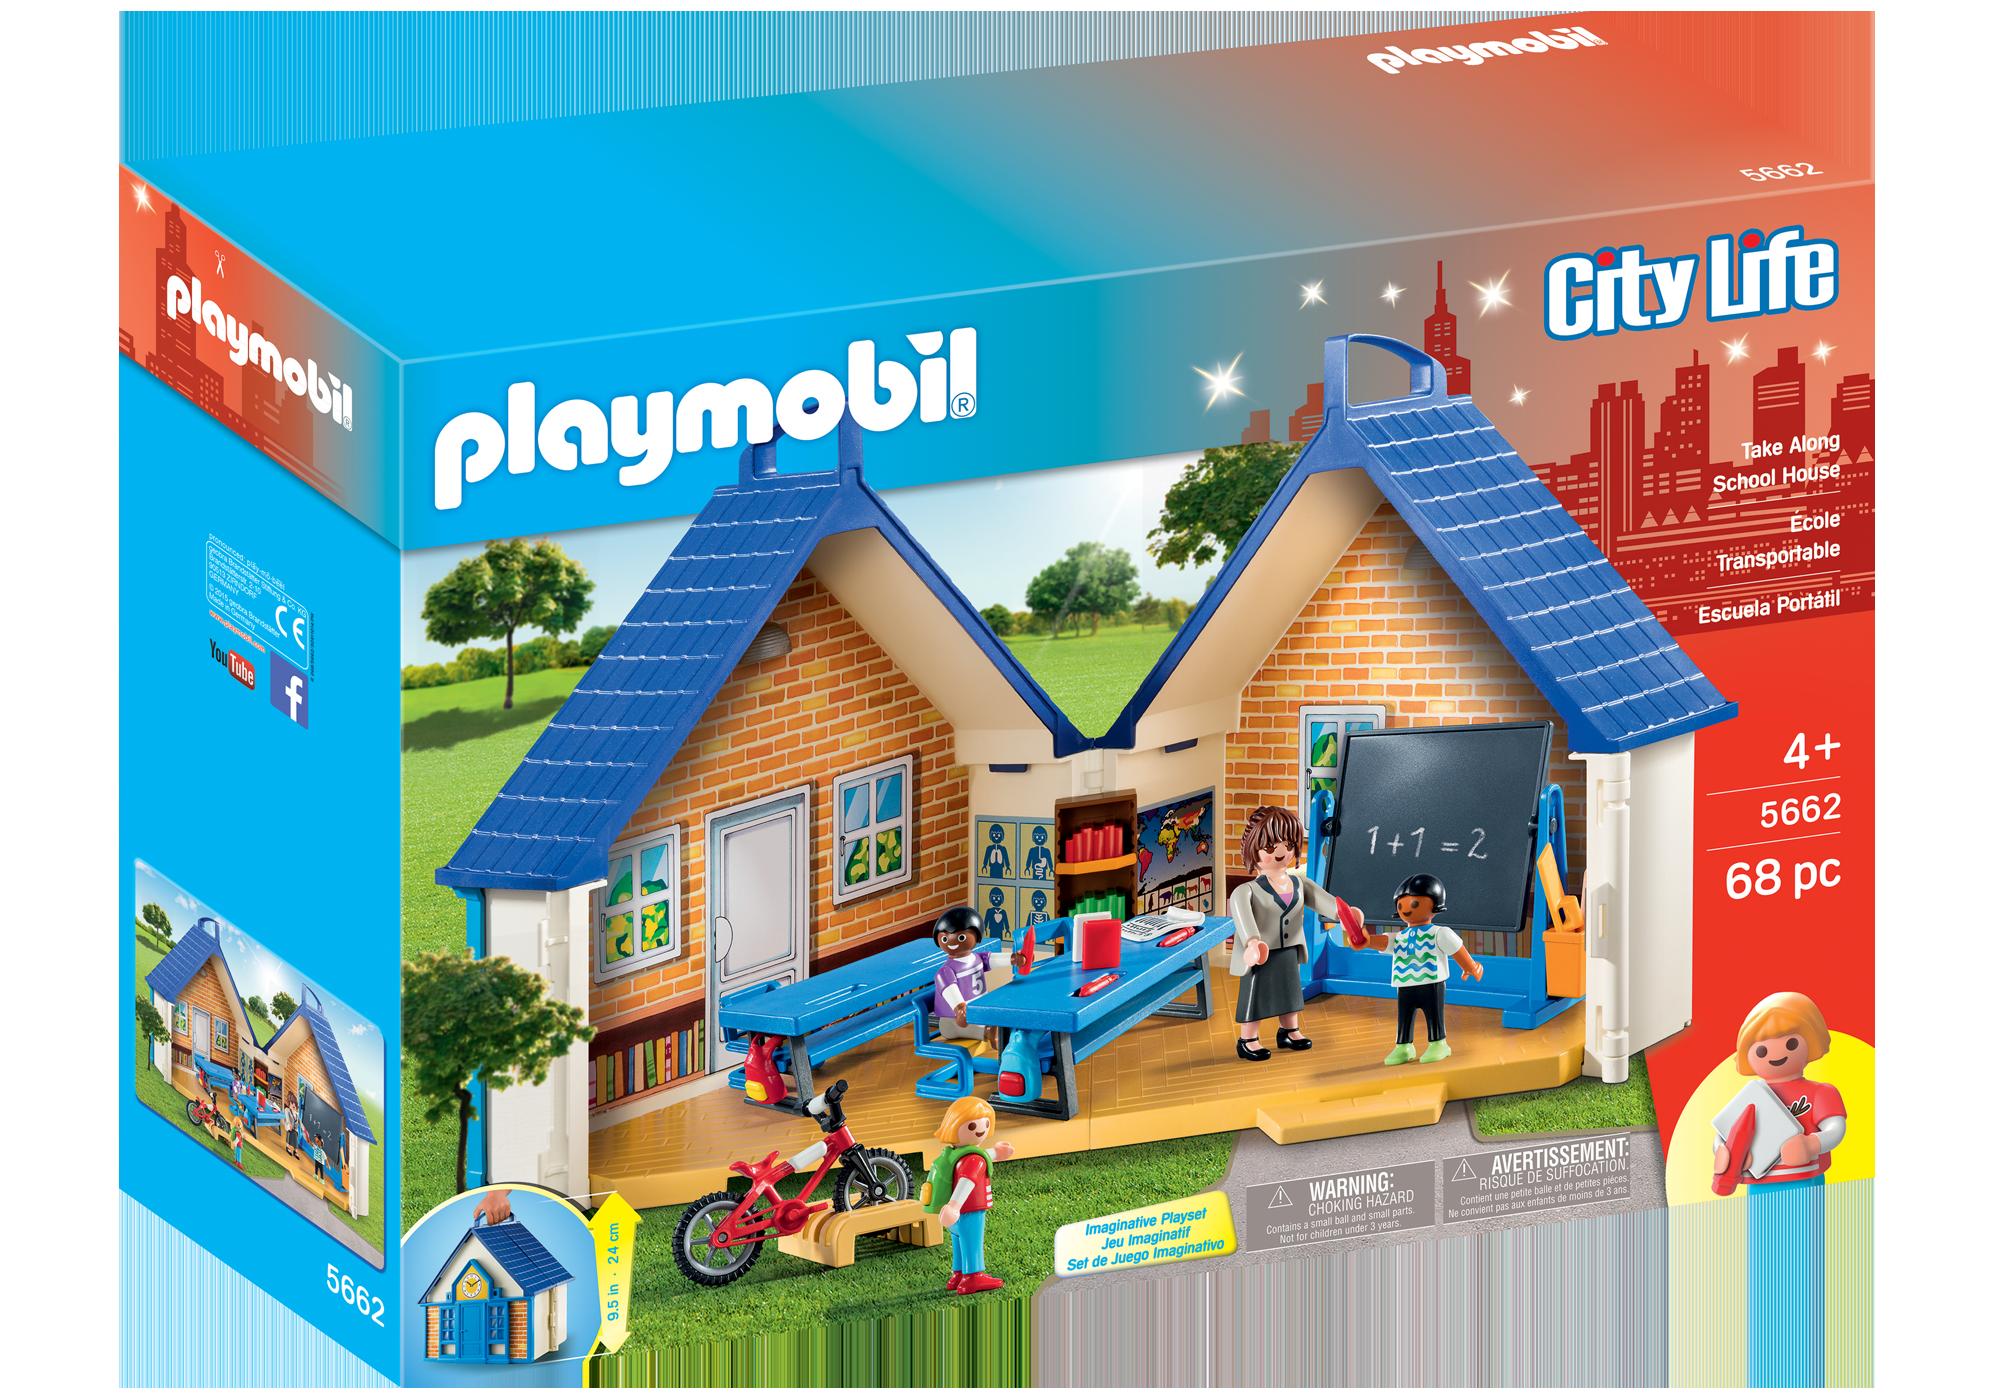 http://media.playmobil.com/i/playmobil/5662_product_box_front/Take Along School House